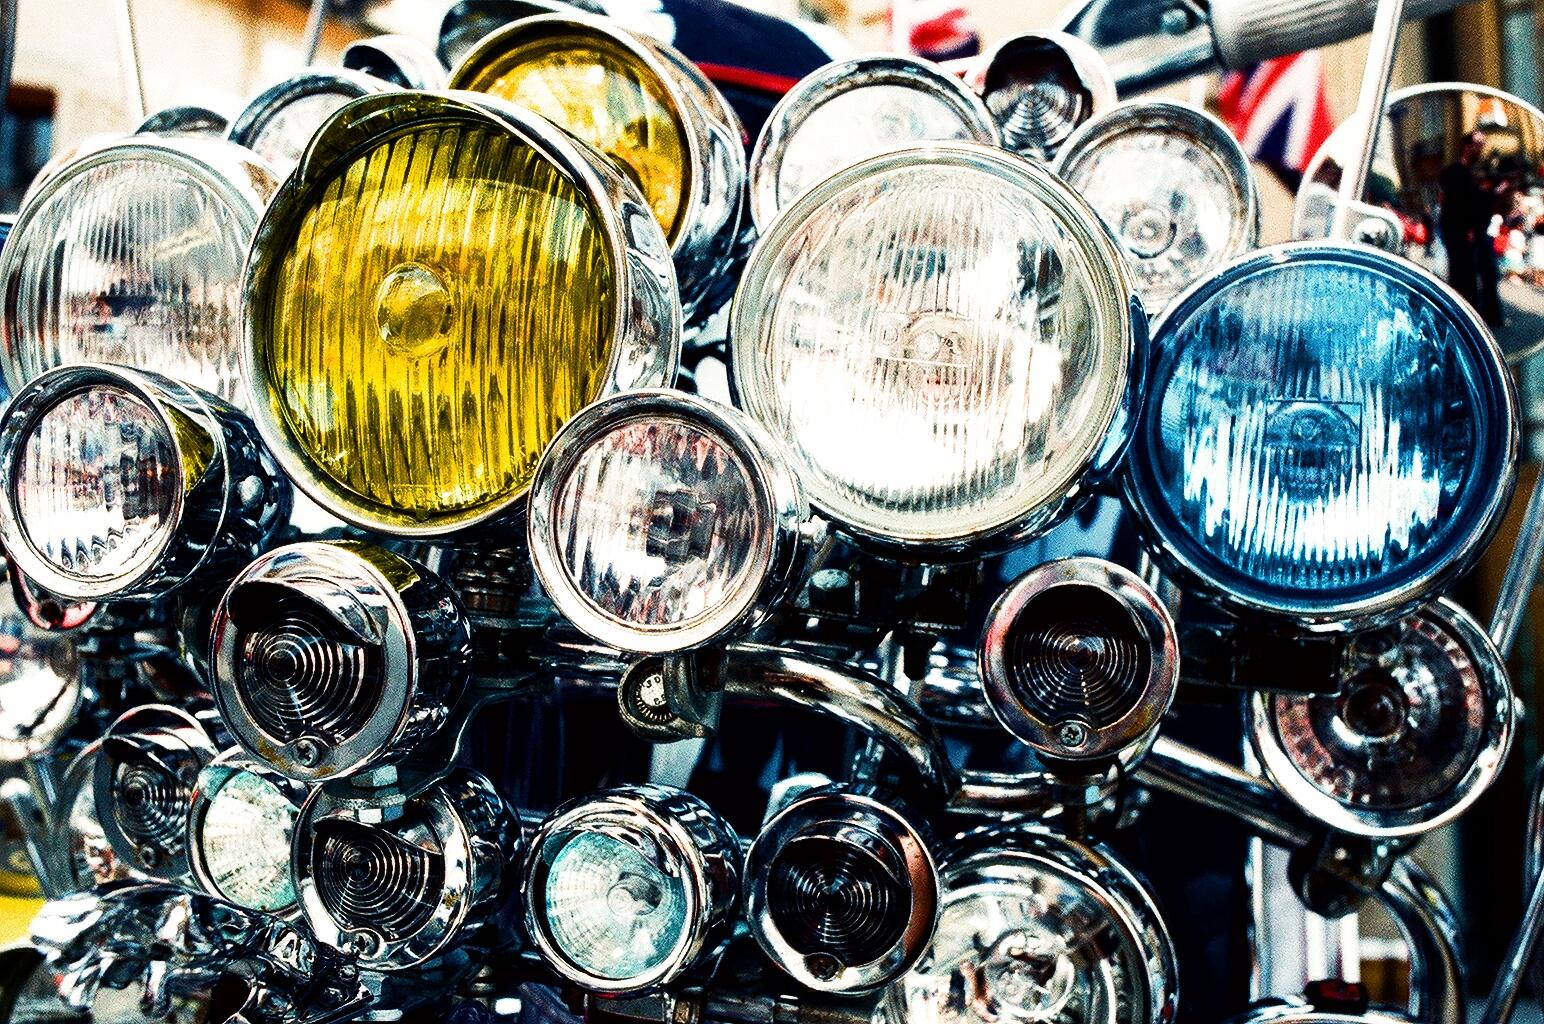 Halogen Motorcycle Headlight